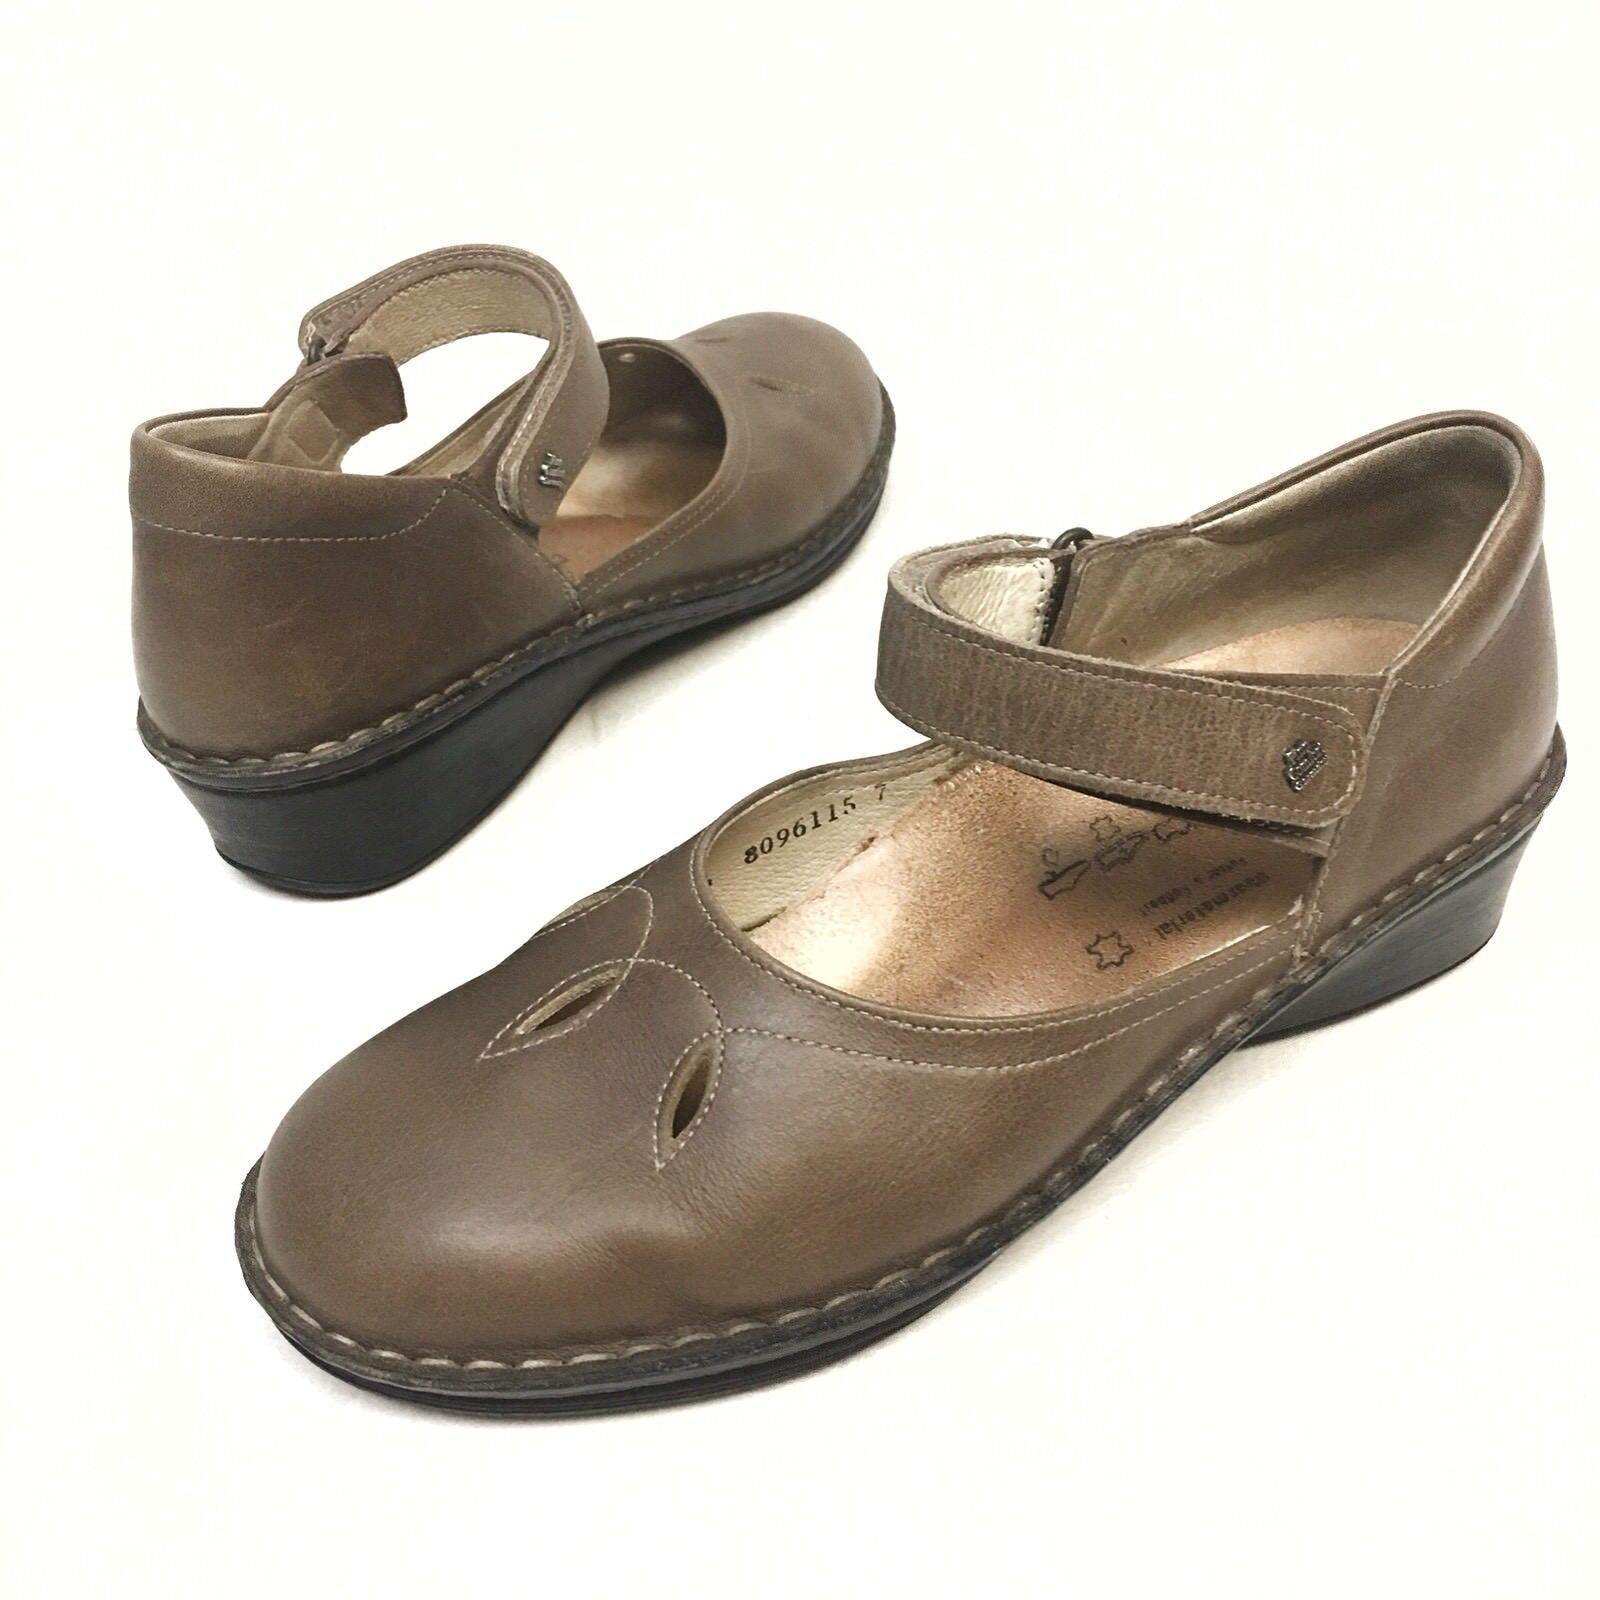 prima i clienti Finn Comfort Canberra Canberra Canberra donna's Mary Jane Flat Marronee scarpe Sz UK6.5 US 9 Comfort  autentico